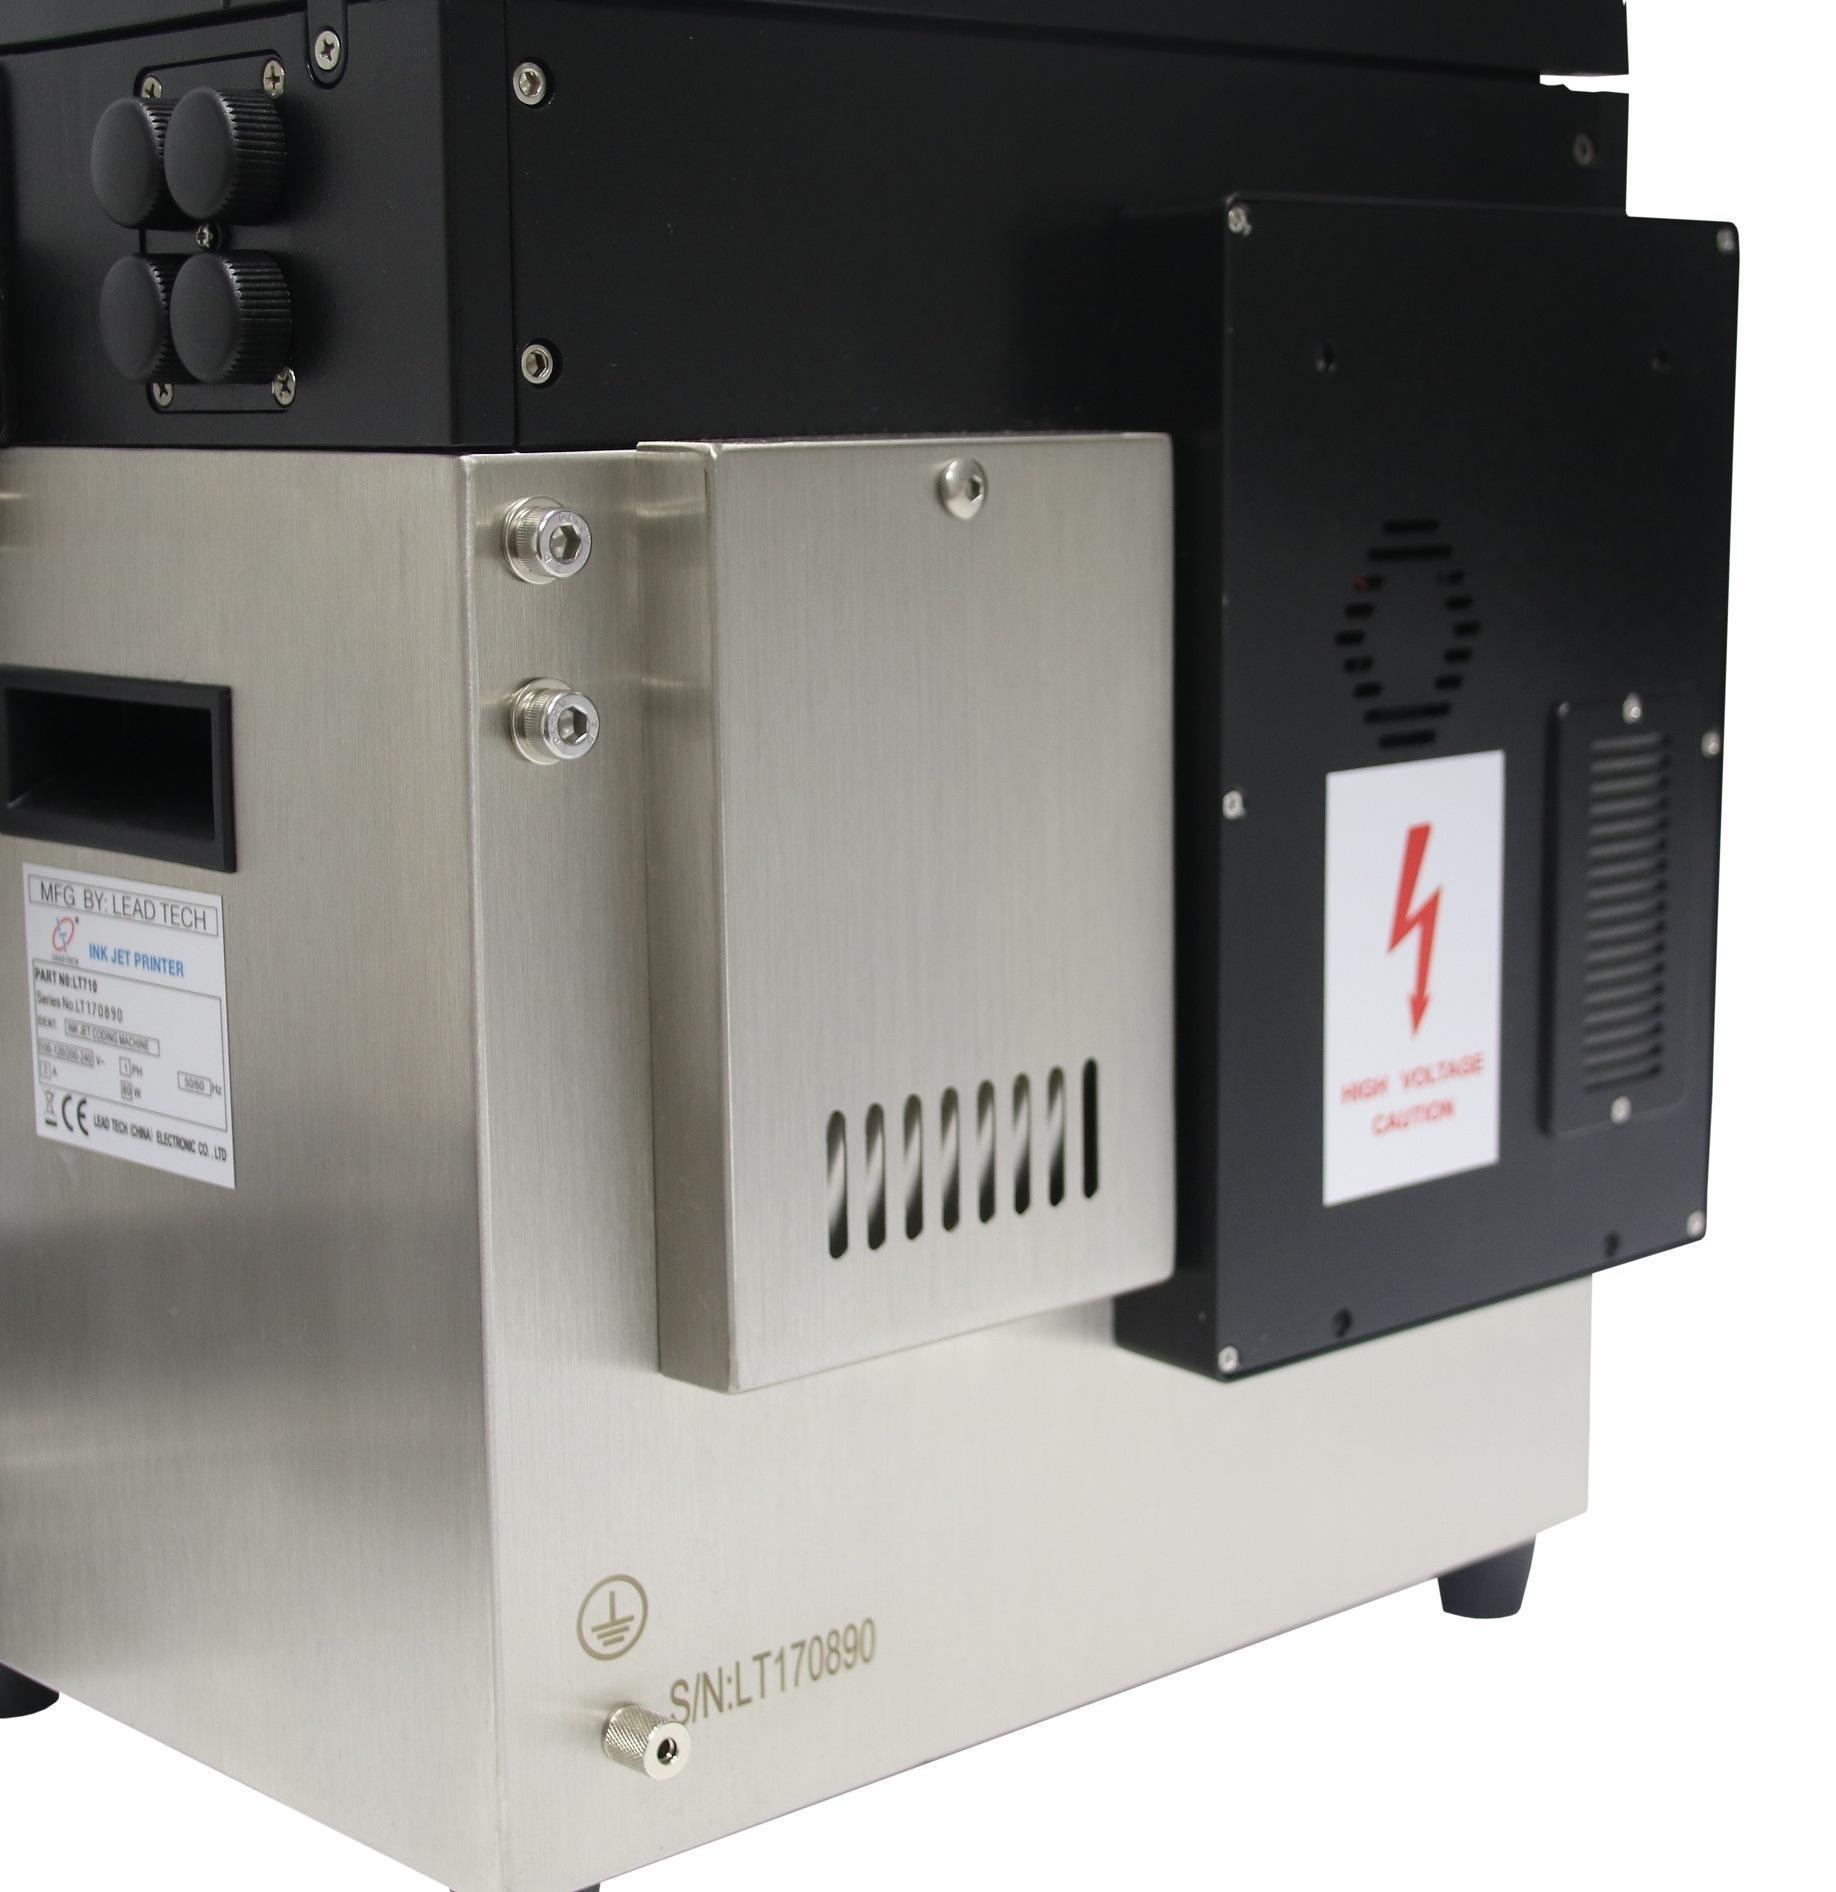 Lead Tech Lt760 Egg Coding Continuous Inkjet Printer